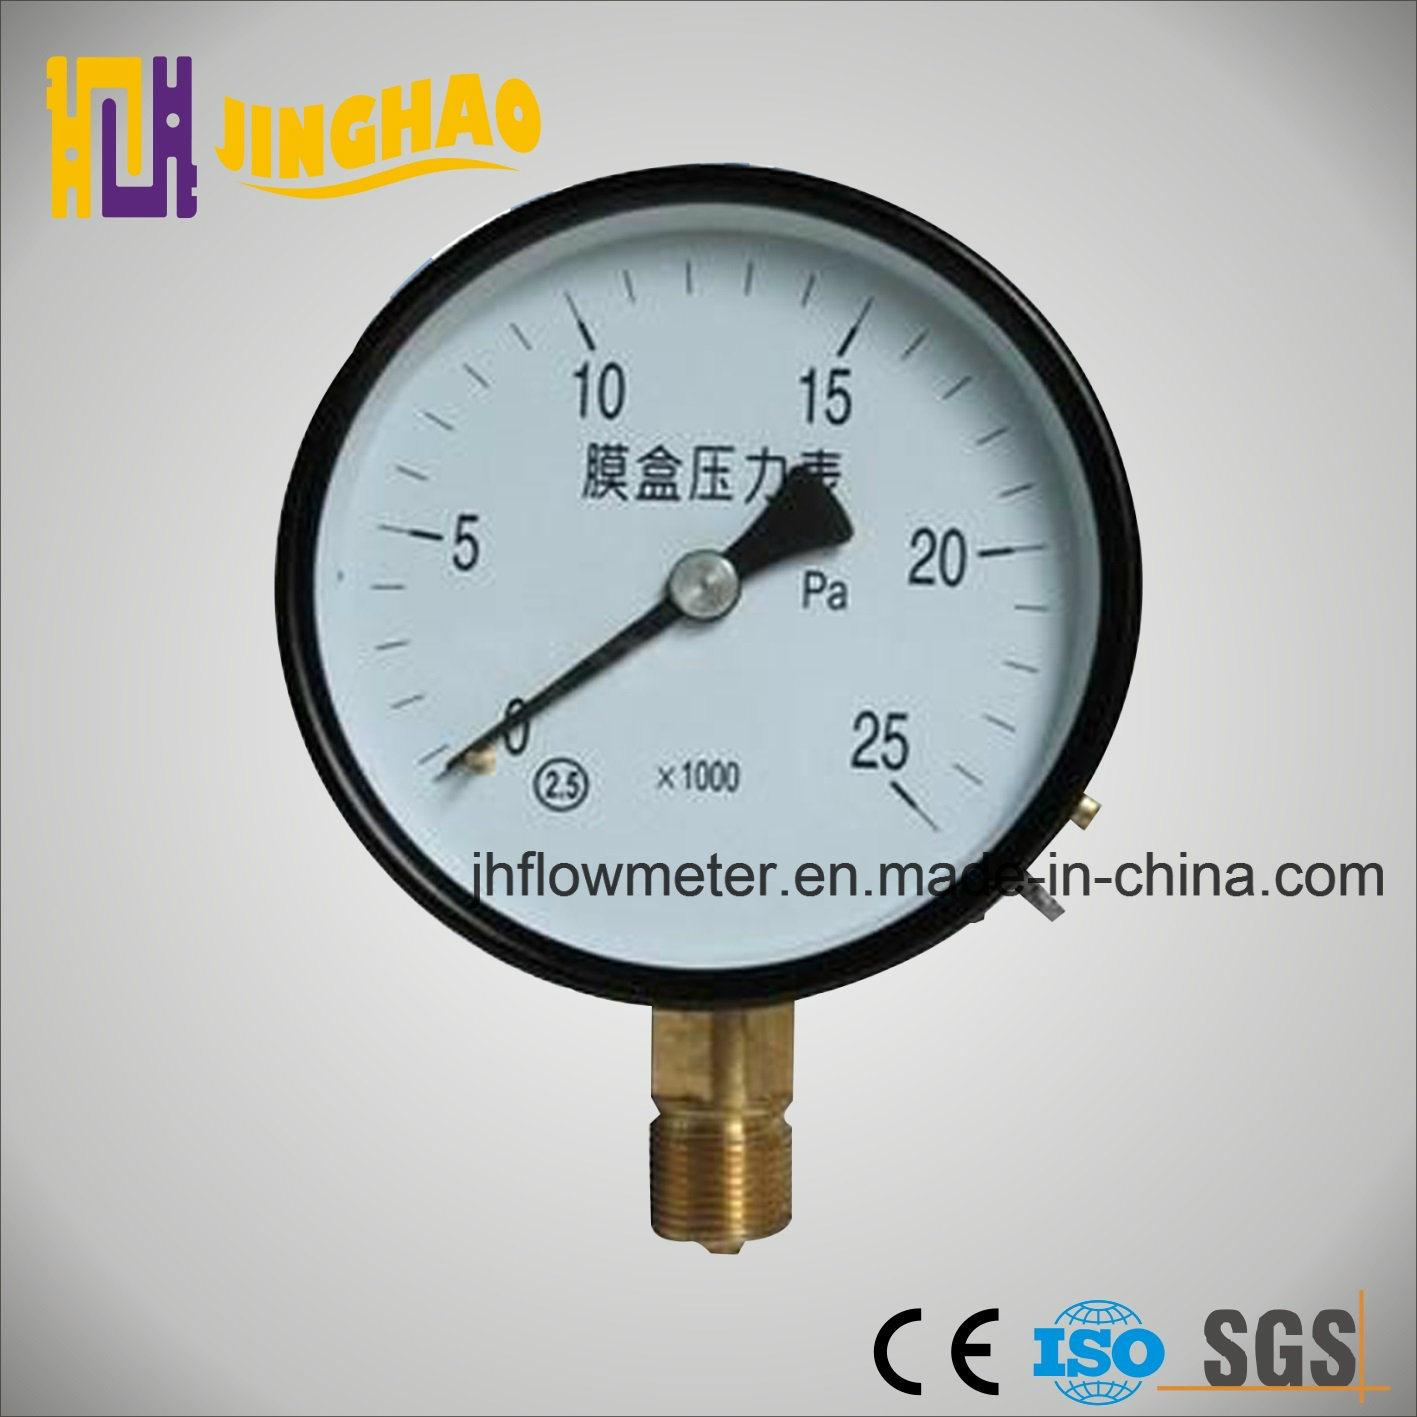 Capsule Belows Pressure Gauge with CE Certificate (JH-YL-TFE)